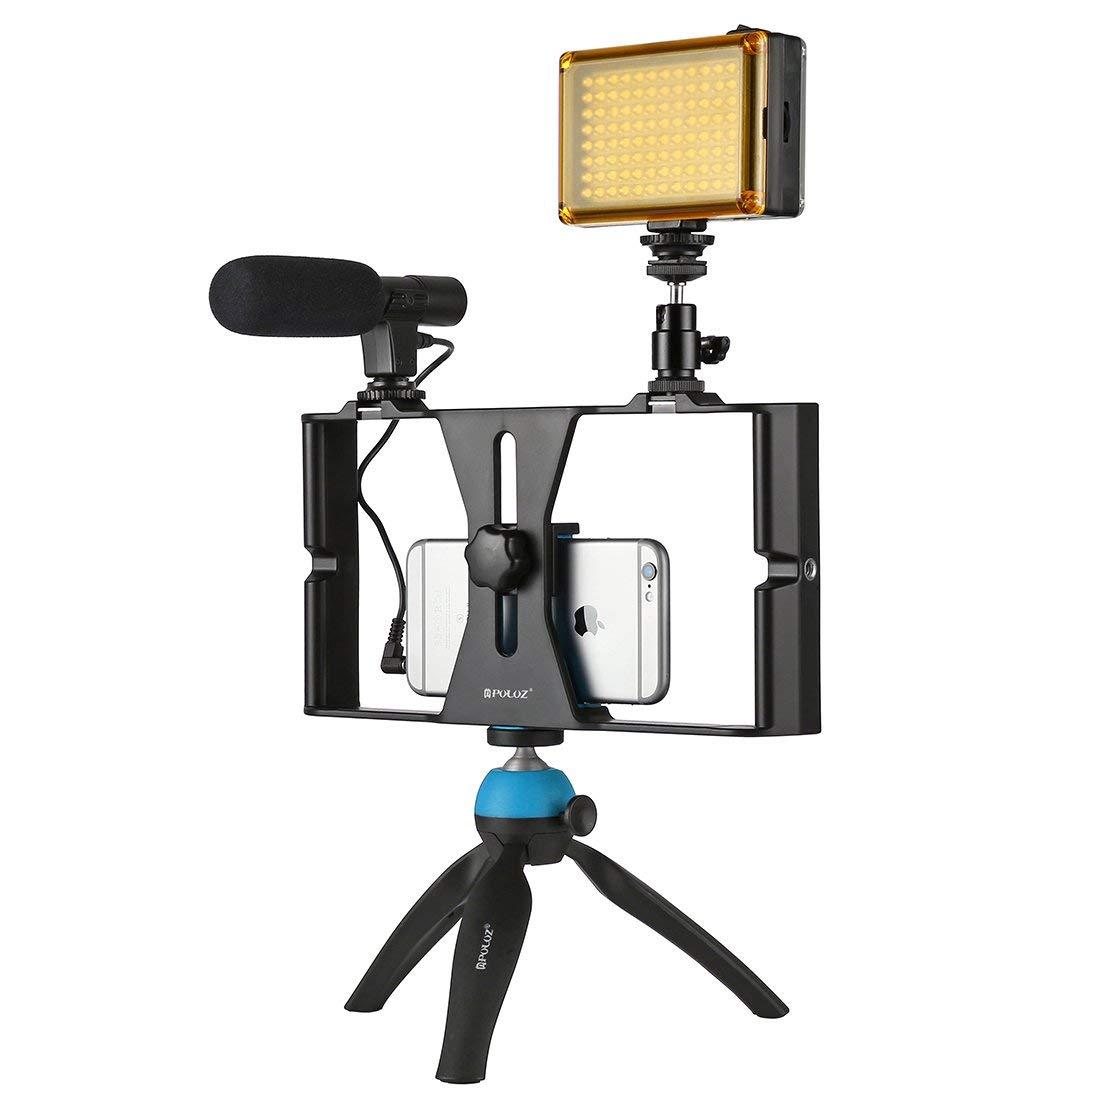 PULUZ PKT3023 Smartphone Video Rig LED Studio Light Video Shotgun Microphone Mini Tripod Mount Kits